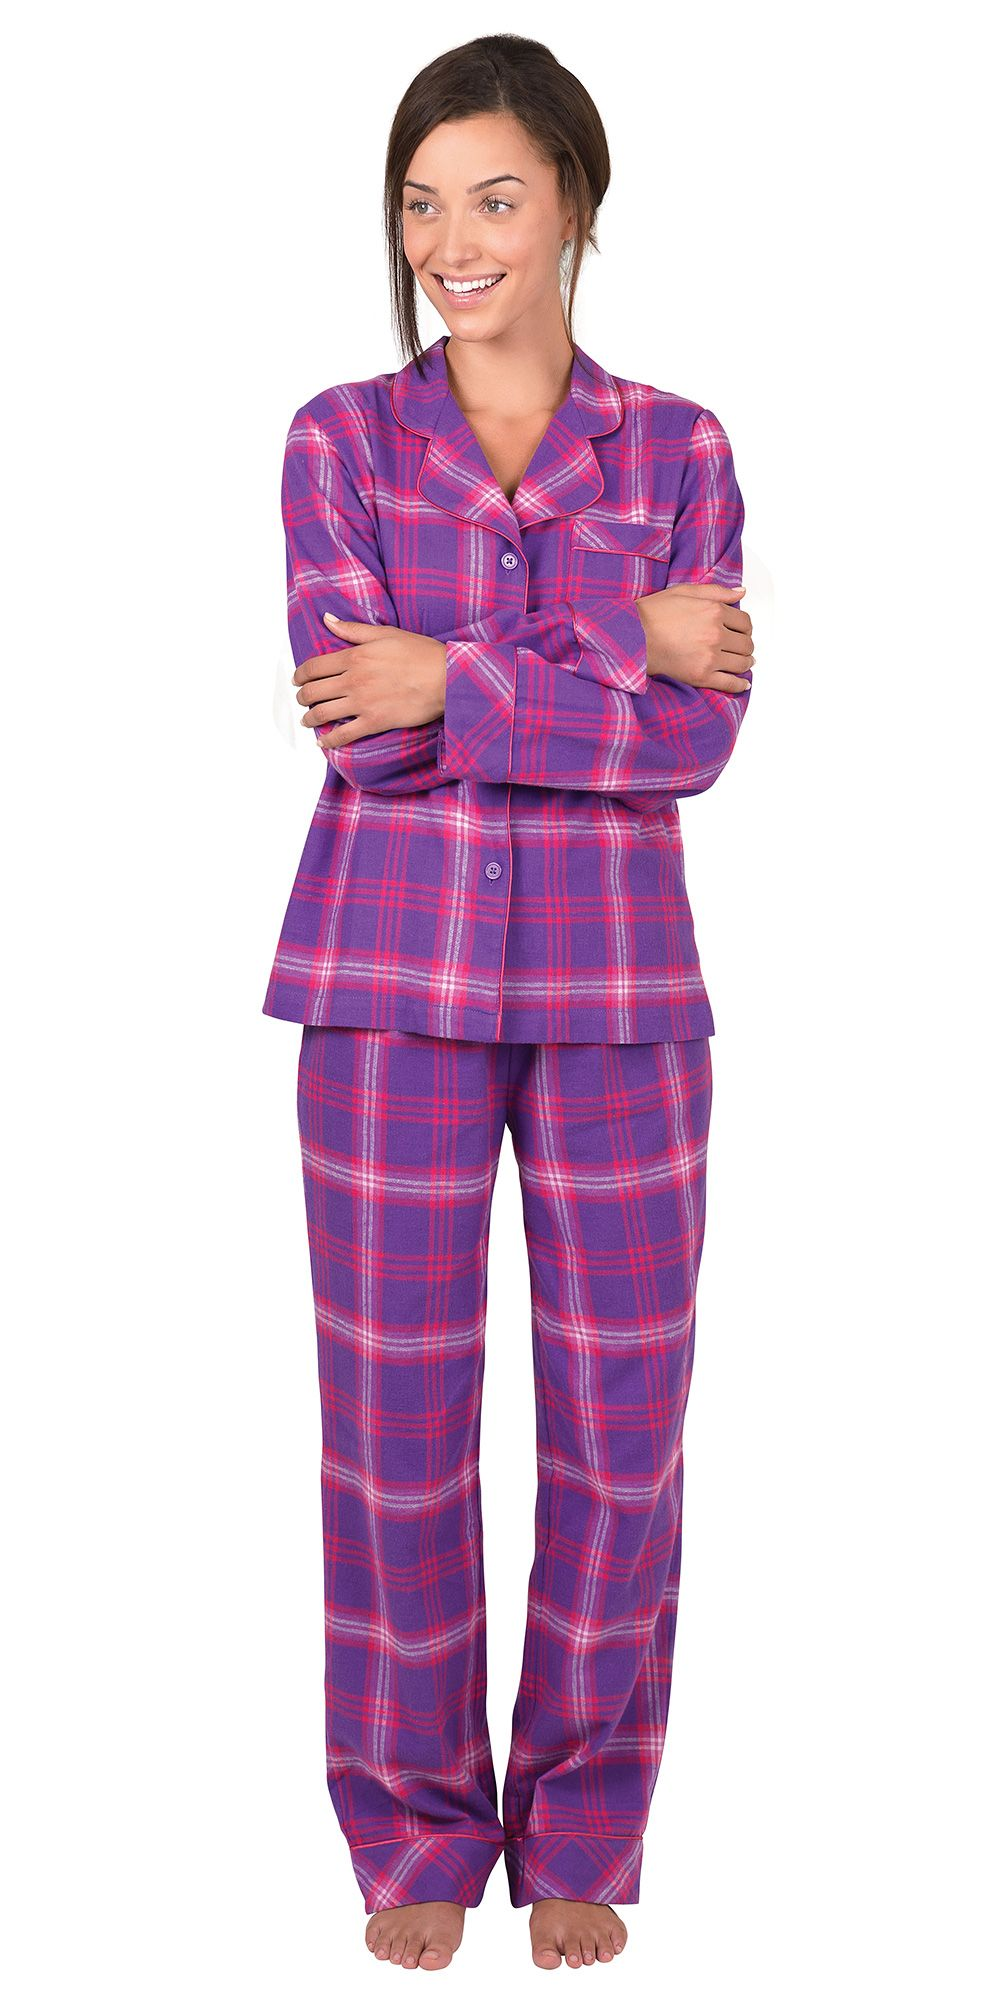 Fun Flannel Pajamas Breeze Clothing